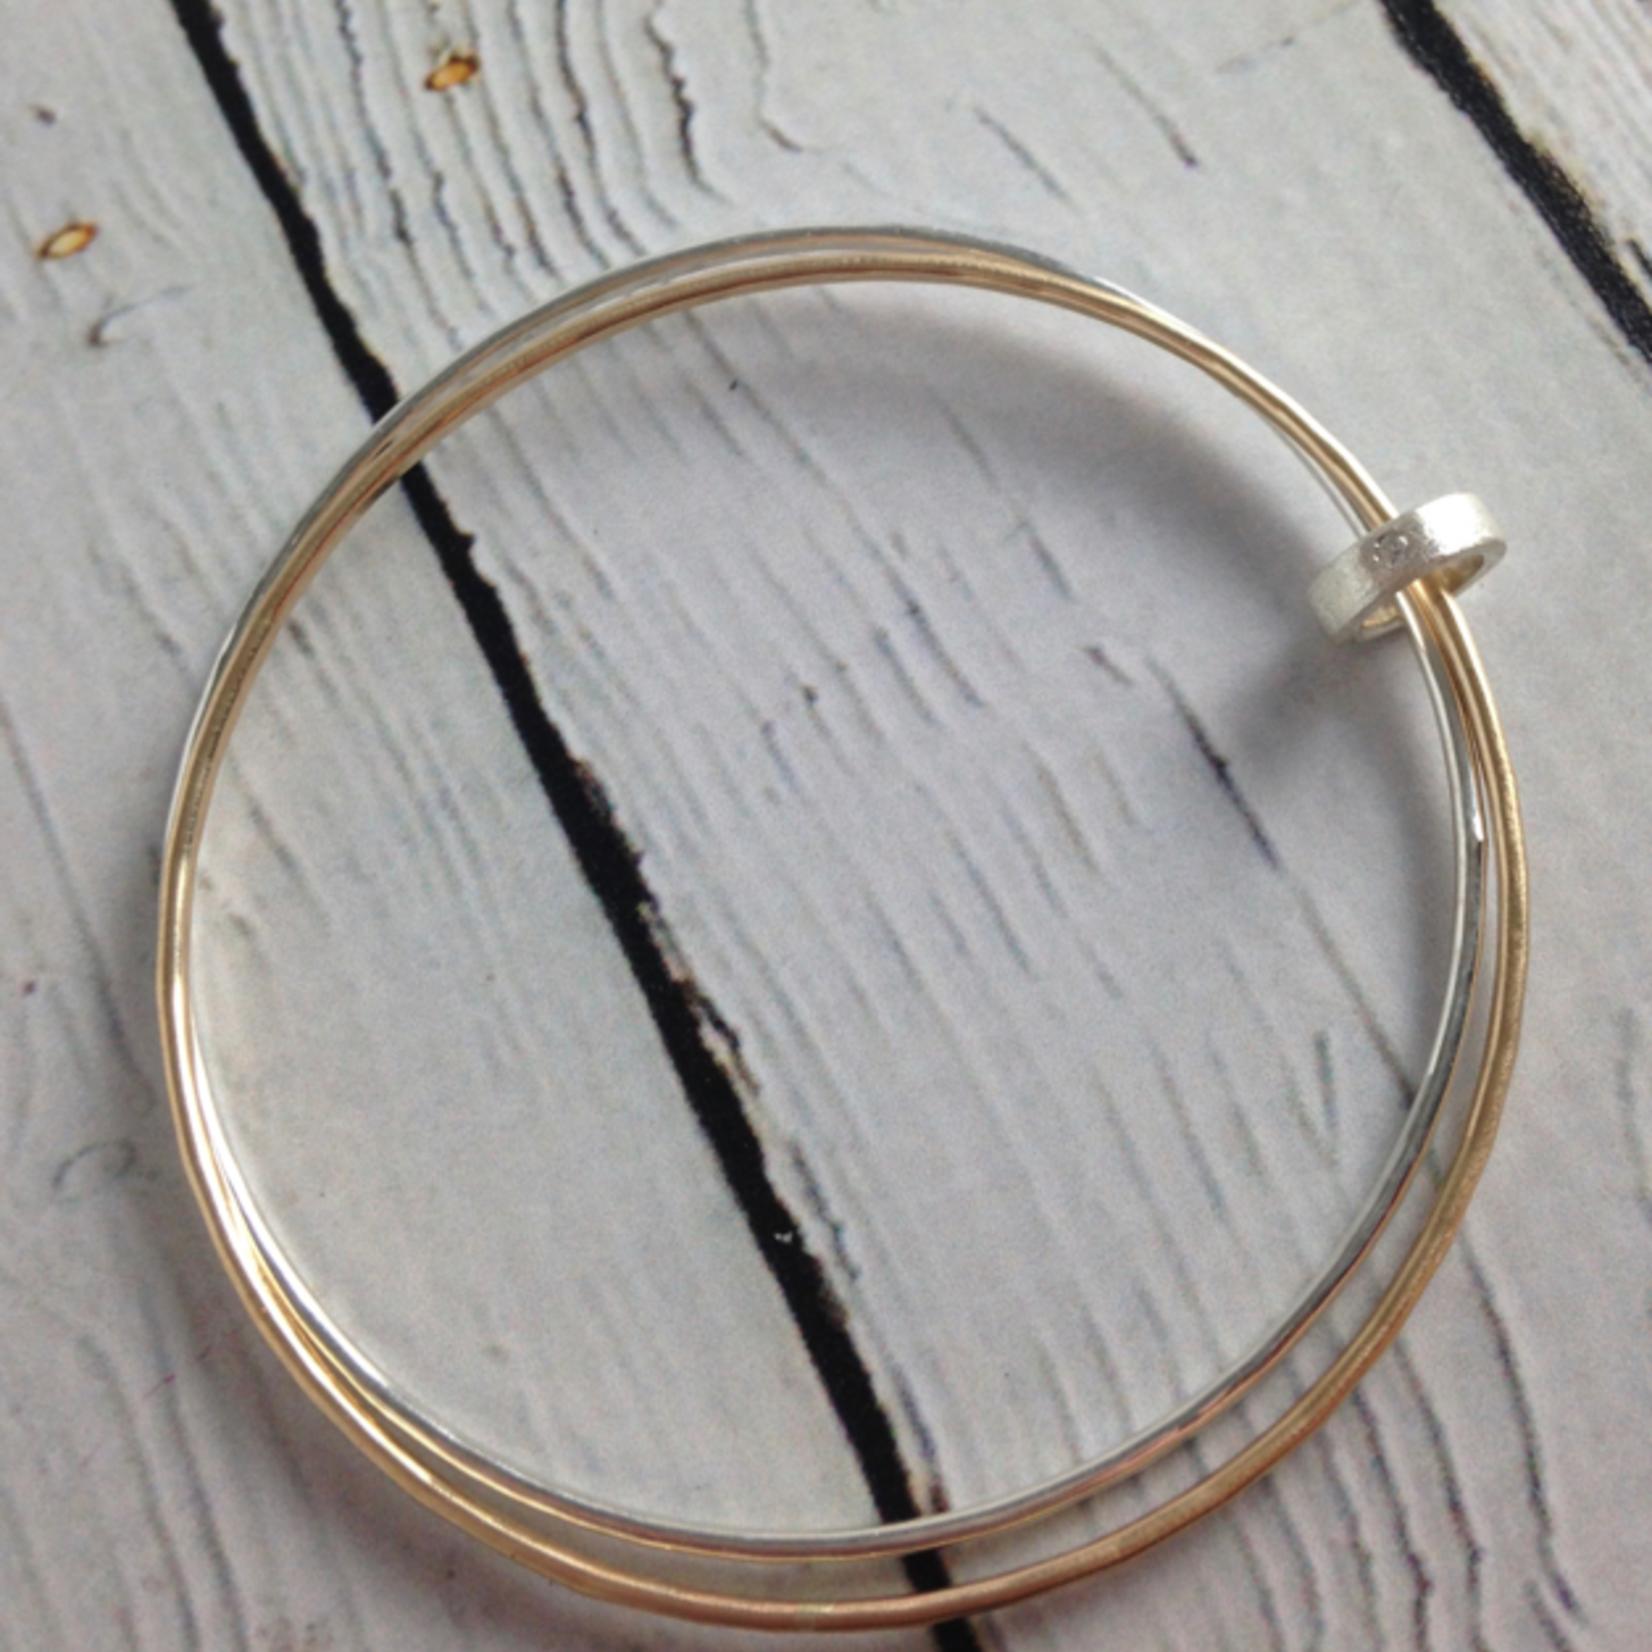 Handmade Hammered 14k GF and Sterling Silver Bangle Bracelet set with CZ connector